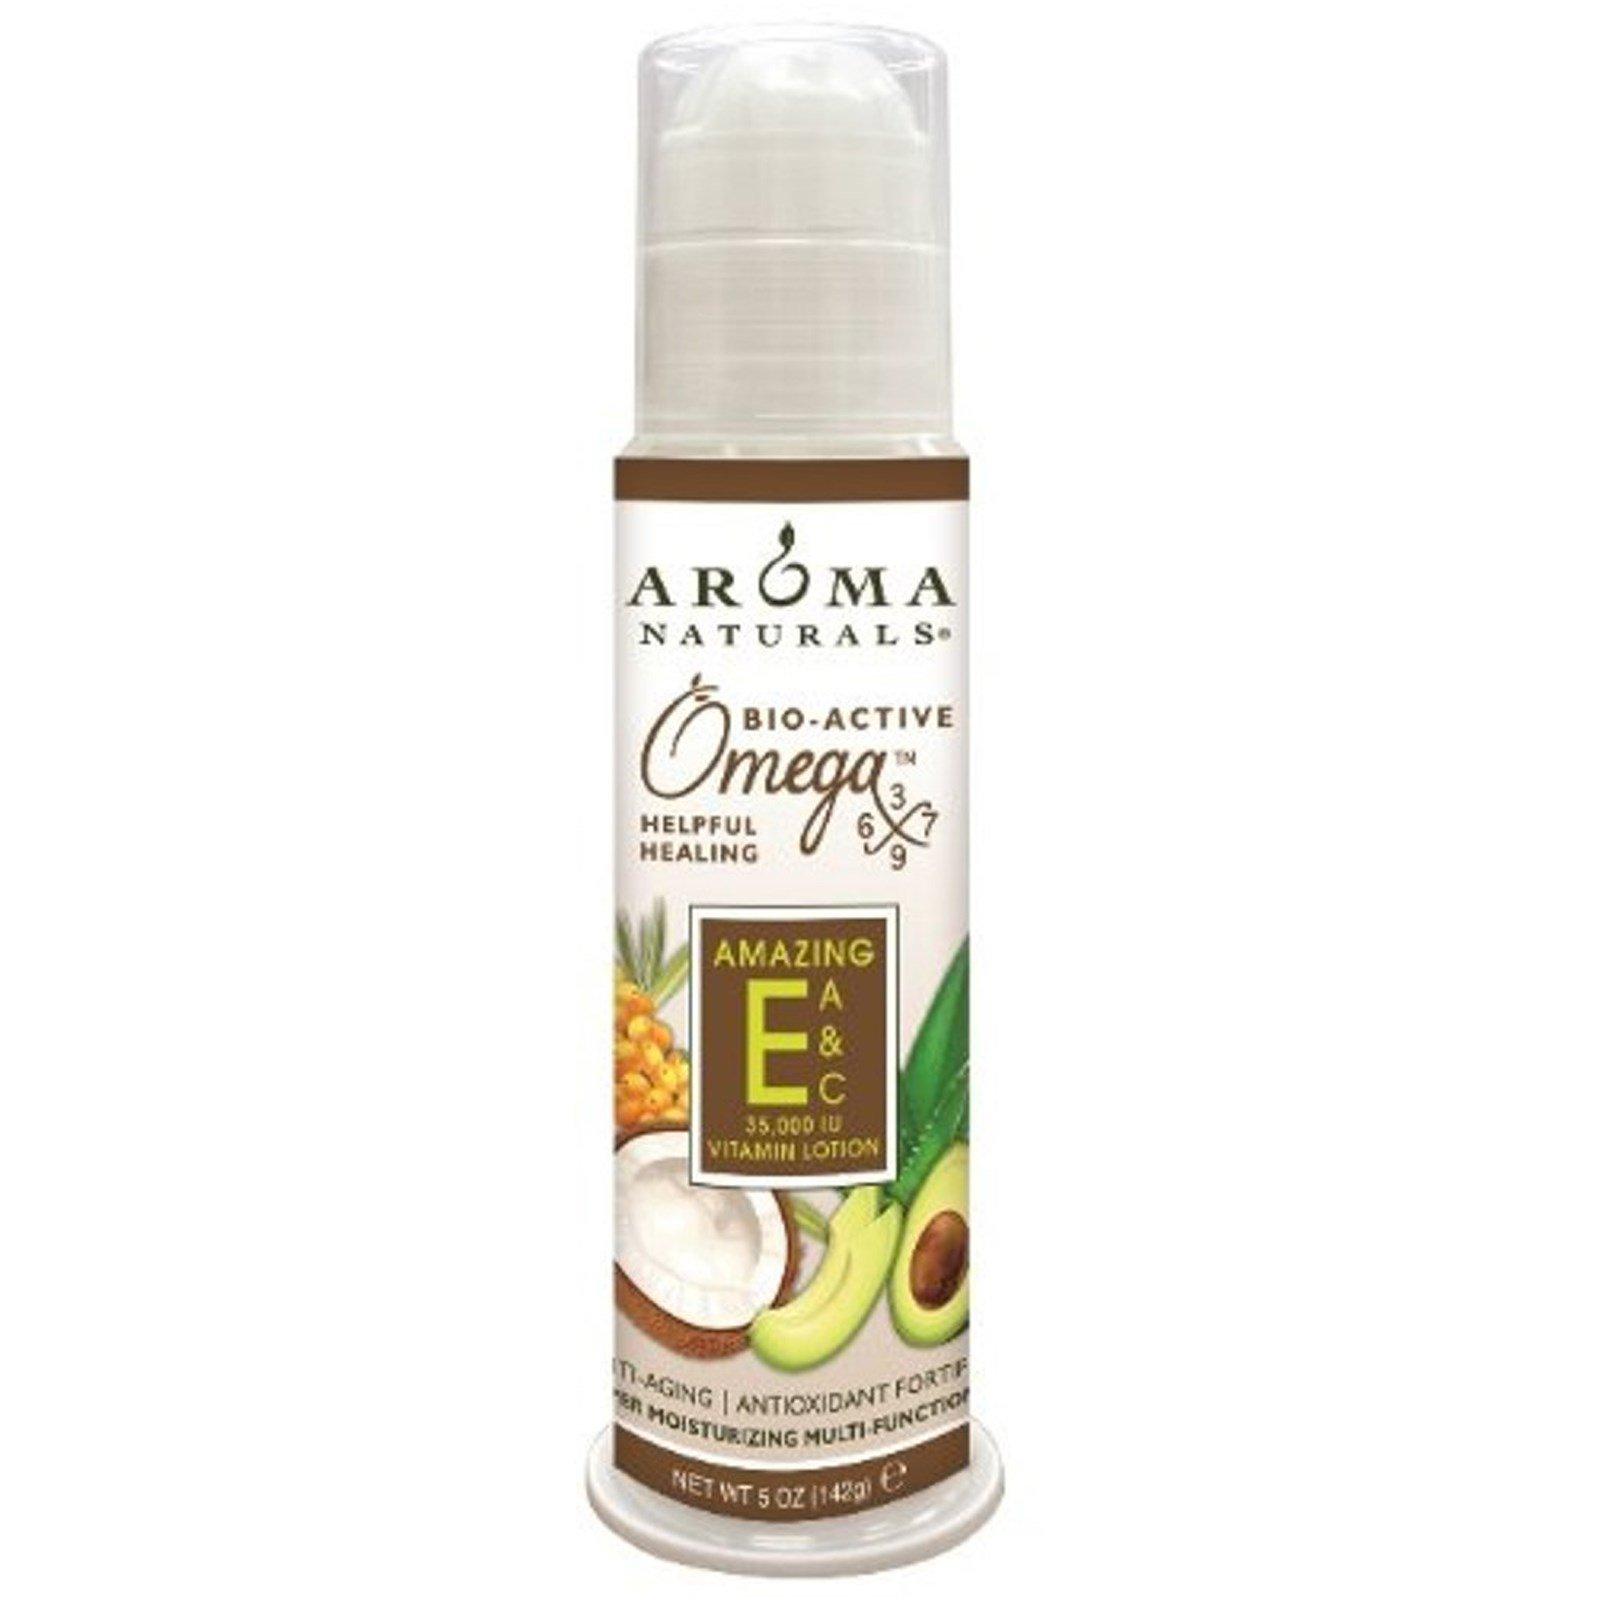 Aroma Naturals, Лосьон с витамином Е, Amazing, обогащен витаминами A и C, 5 унций (142 г)